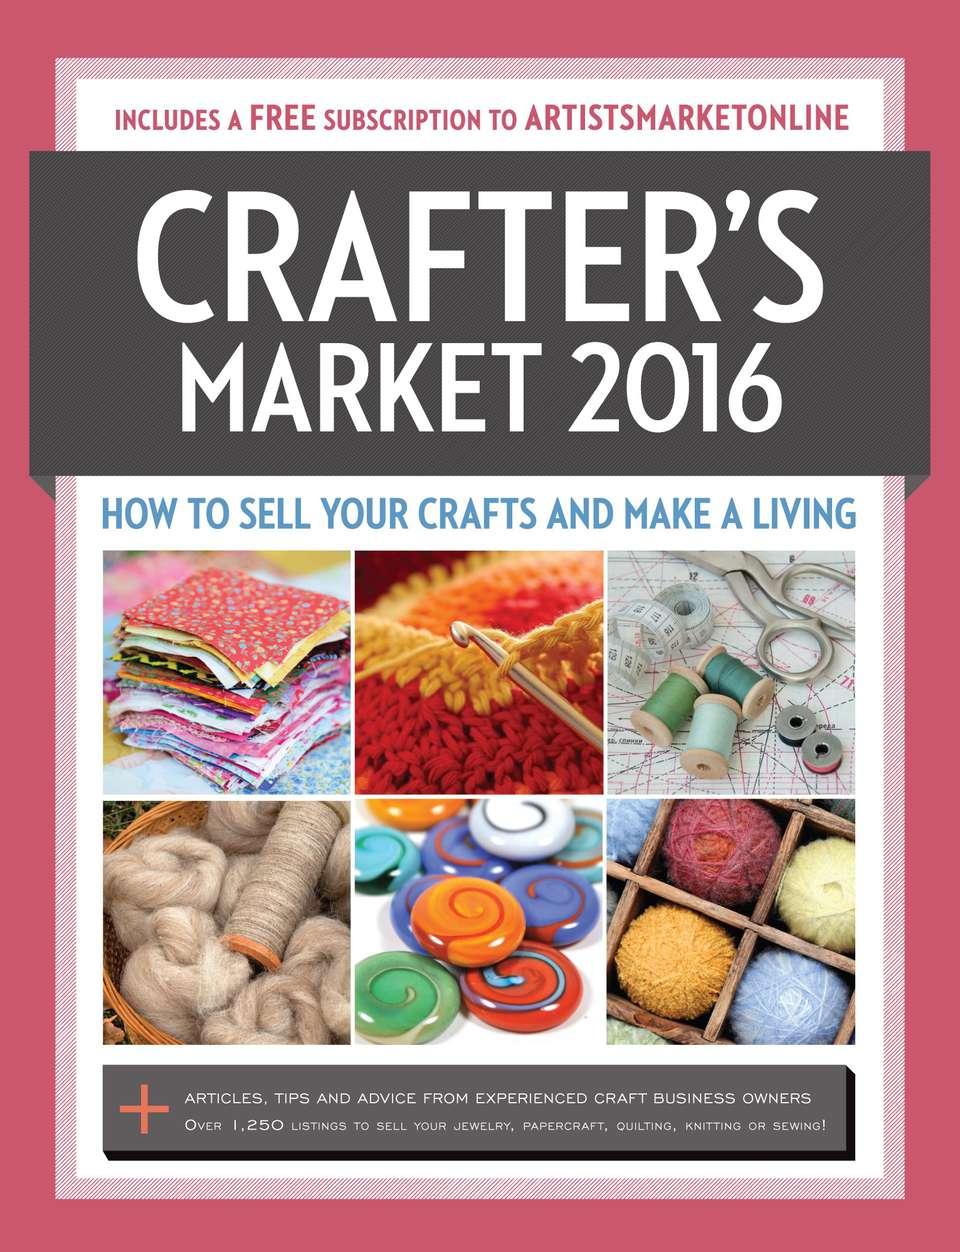 Crafter's Market Book